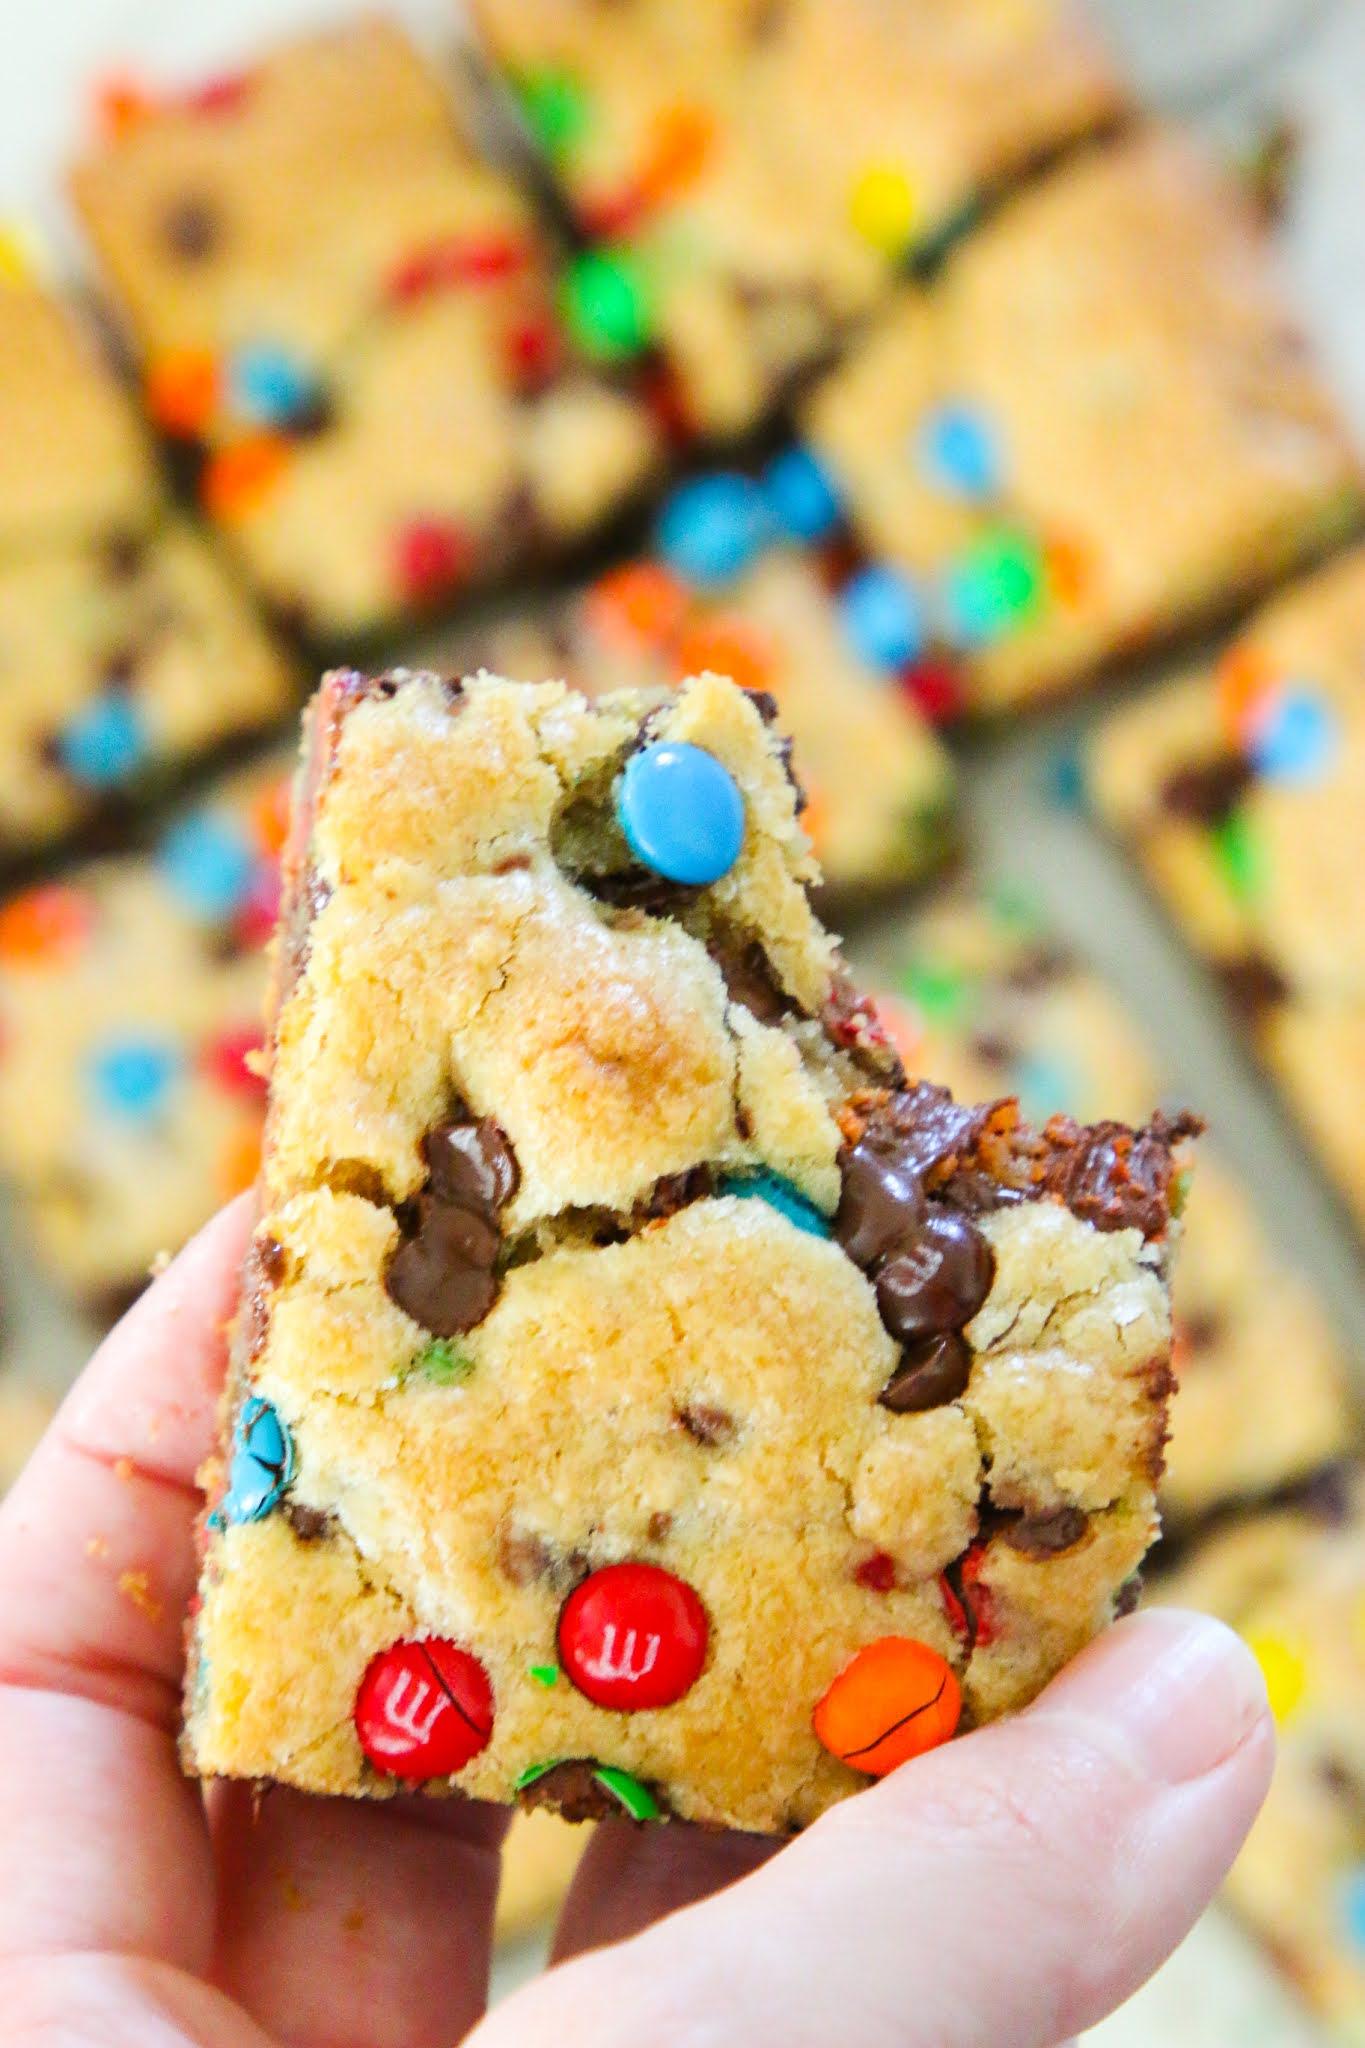 The best blondies cookies. m&m chocolate chip blondes. M&M bars. Blondies recipe. Rainbow blondies. M&M brownies. Brown butter m&m blondies. M&M cookie recipes. The best m&m dessert recipes. Easy family night recipes. The best cookie bar recipe. Cookie bar recipes. The best cookie cake recipe. #cookies #chocolate #baking #cookiecake #cookiebars